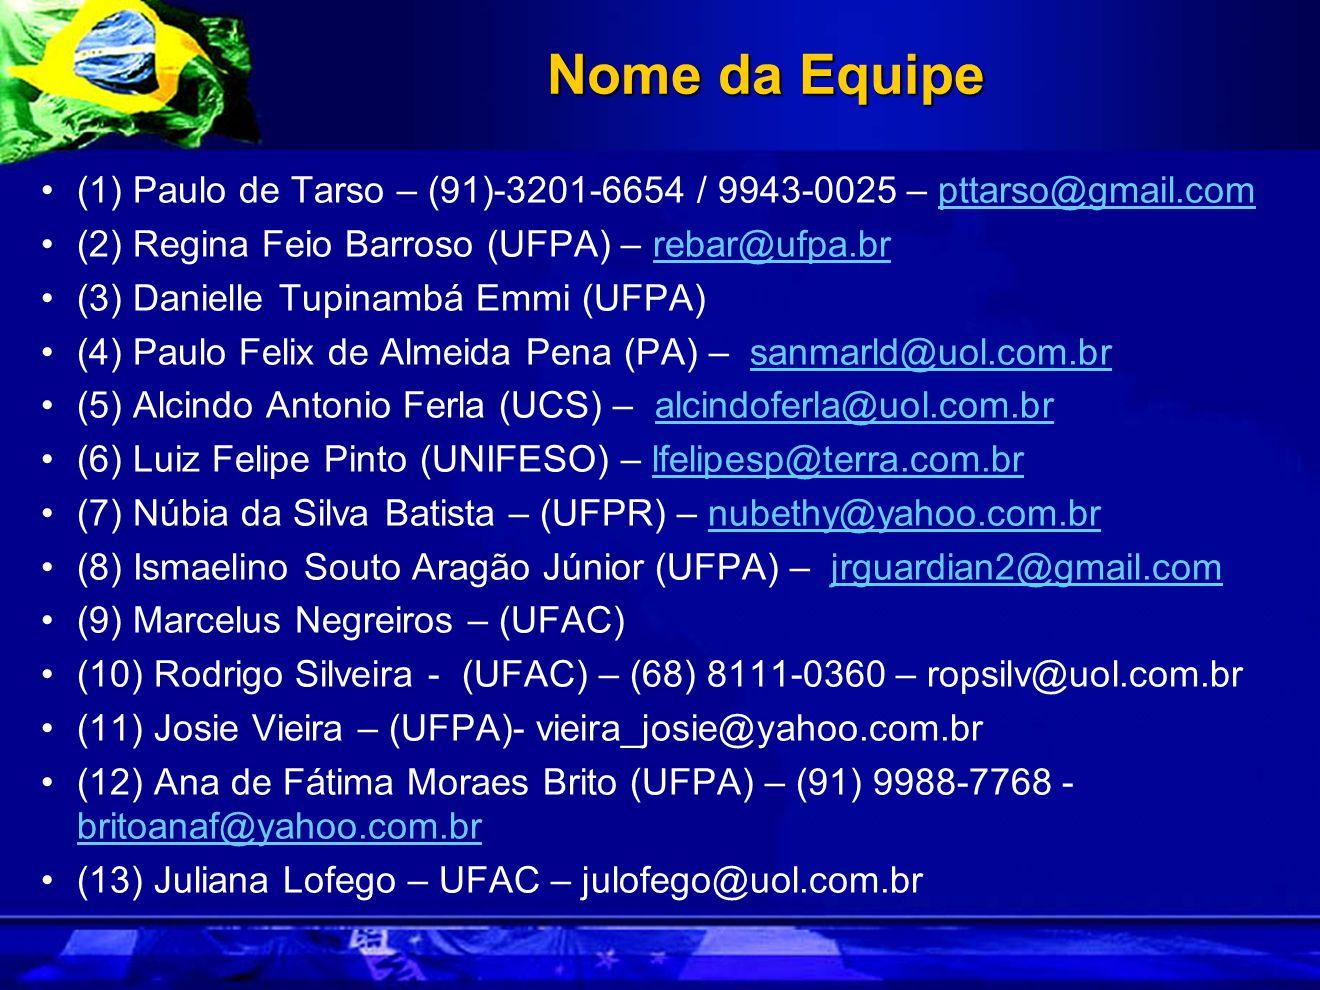 Nome da Equipe (1) Paulo de Tarso – (91)-3201-6654 / 9943-0025 – pttarso@gmail.compttarso@gmail.com (2) Regina Feio Barroso (UFPA) – rebar@ufpa.brrebar@ufpa.br (3) Danielle Tupinambá Emmi (UFPA) (4) Paulo Felix de Almeida Pena (PA) – sanmarld@uol.com.brsanmarld@uol.com.br (5) Alcindo Antonio Ferla (UCS) – alcindoferla@uol.com.bralcindoferla@uol.com.br (6) Luiz Felipe Pinto (UNIFESO) – lfelipesp@terra.com.brlfelipesp@terra.com.br (7) Núbia da Silva Batista – (UFPR) – nubethy@yahoo.com.brnubethy@yahoo.com.br (8) Ismaelino Souto Aragão Júnior (UFPA) – jrguardian2@gmail.comjrguardian2@gmail.com (9) Marcelus Negreiros – (UFAC) (10) Rodrigo Silveira - (UFAC) – (68) 8111-0360 – ropsilv@uol.com.br (11) Josie Vieira – (UFPA)- vieira_josie@yahoo.com.br (12) Ana de Fátima Moraes Brito (UFPA) – (91) 9988-7768 - britoanaf@yahoo.com.br britoanaf@yahoo.com.br (13) Juliana Lofego – UFAC – julofego@uol.com.br